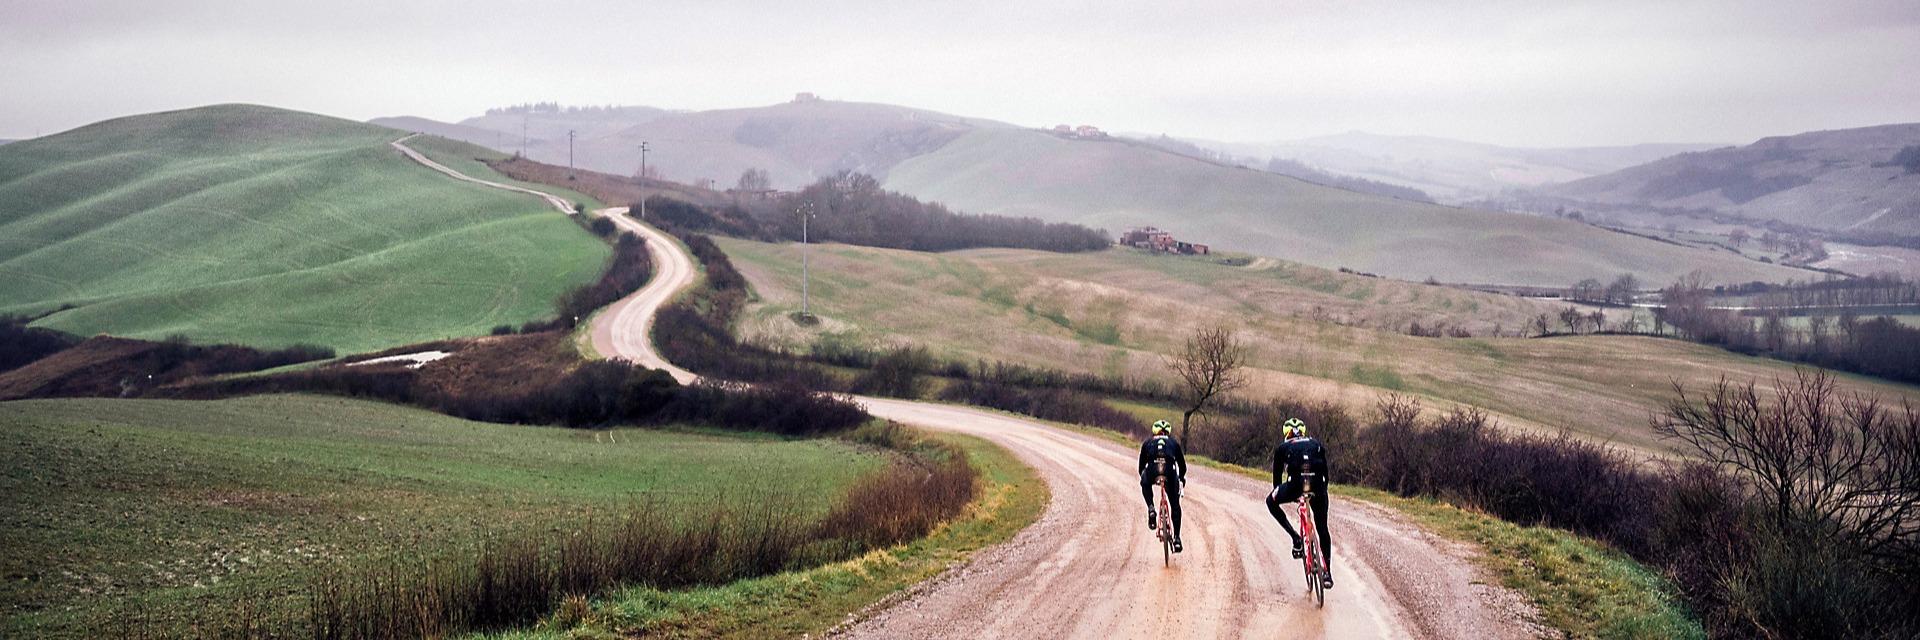 Cyclists ride Trek's Domane on a wet dirt road